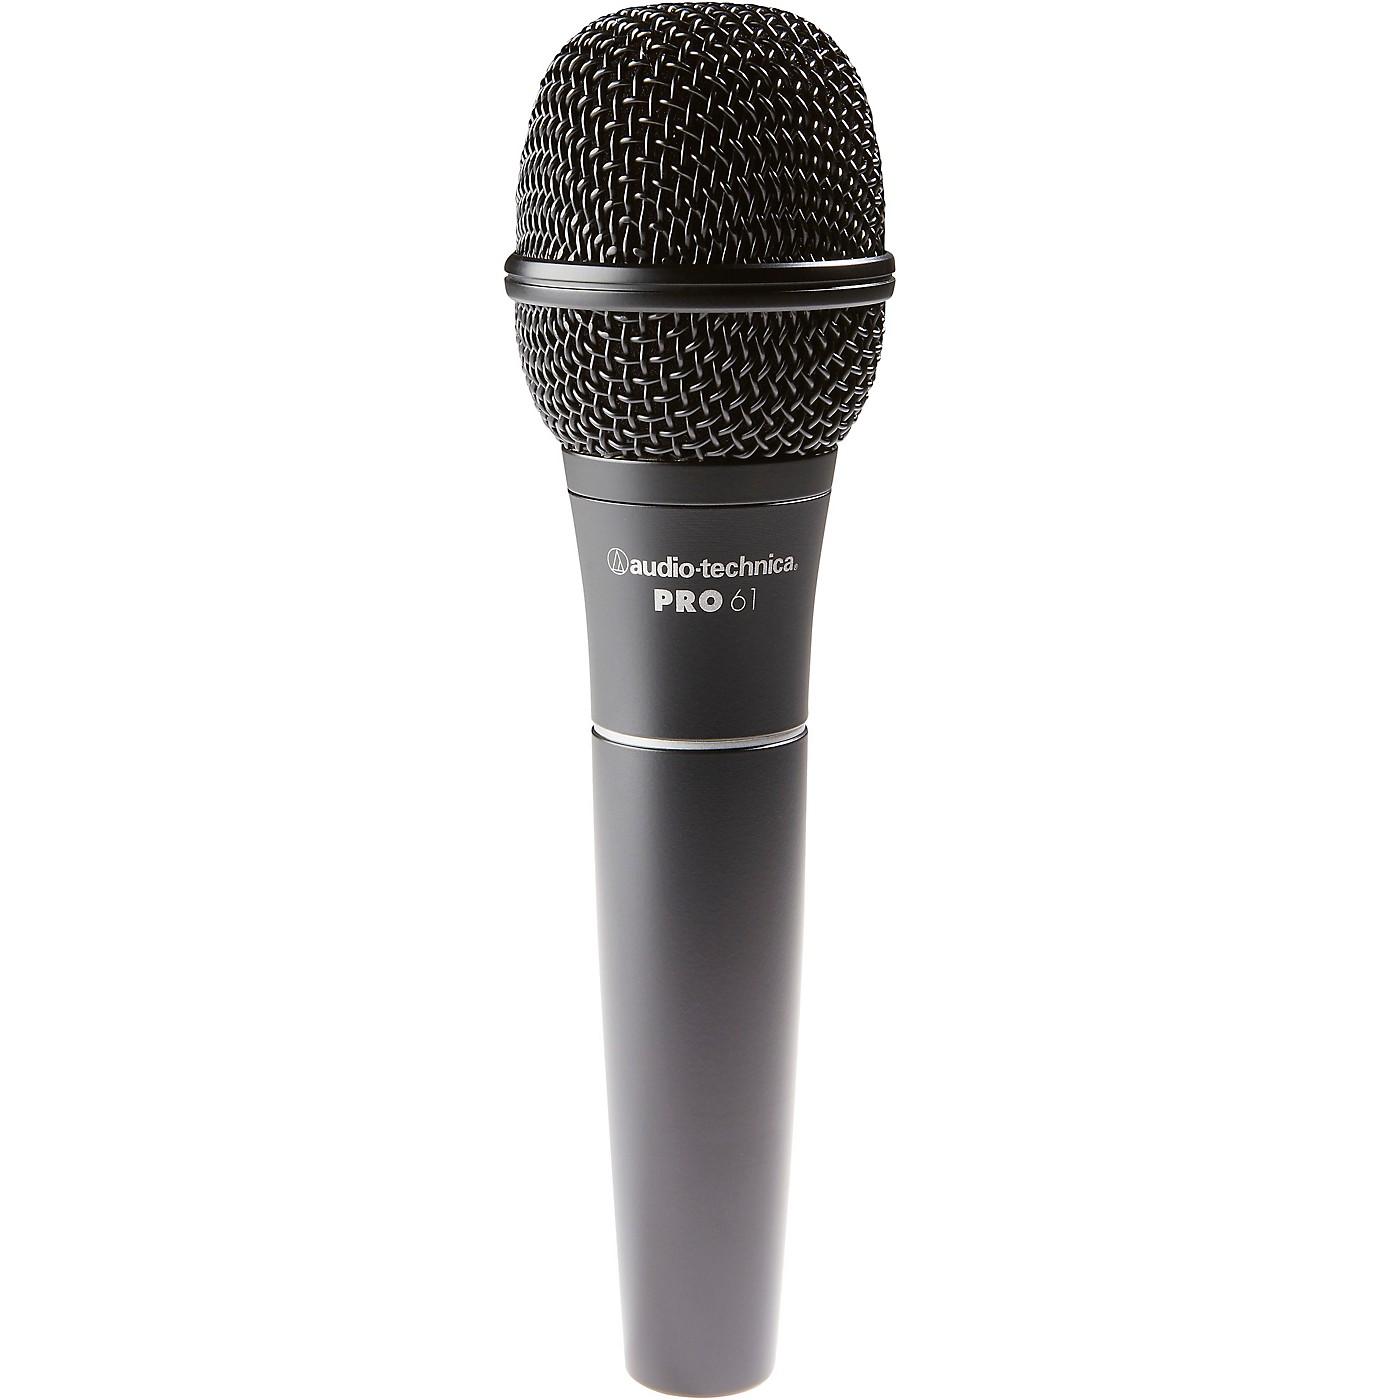 Audio-Technica PRO 61 Hypercardioid Dynamic Microphone thumbnail